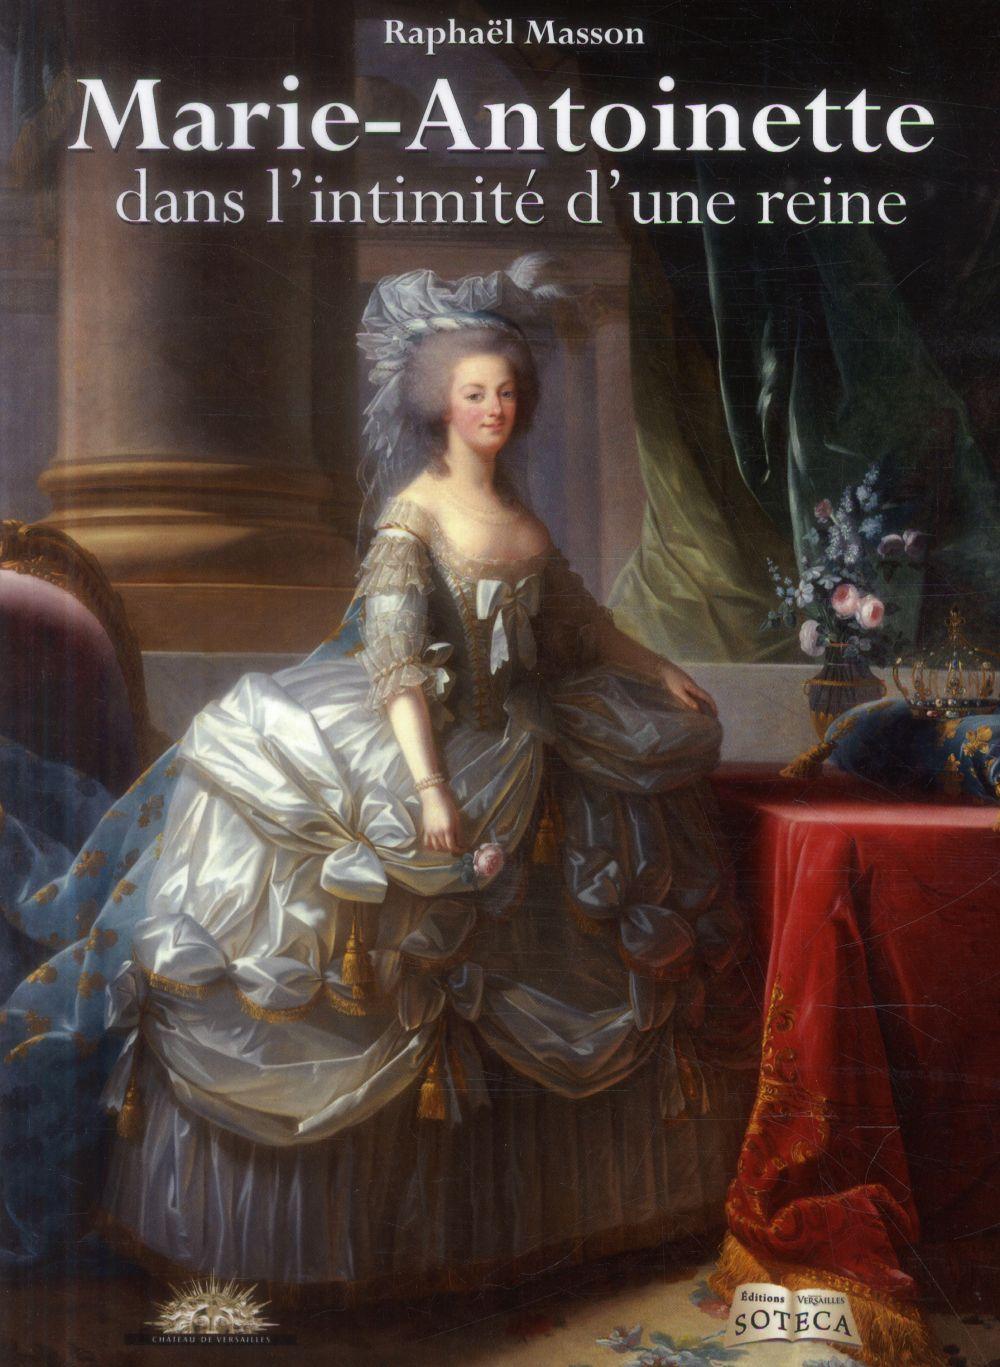 MARIE-ANTOINETTE (ALBUM)